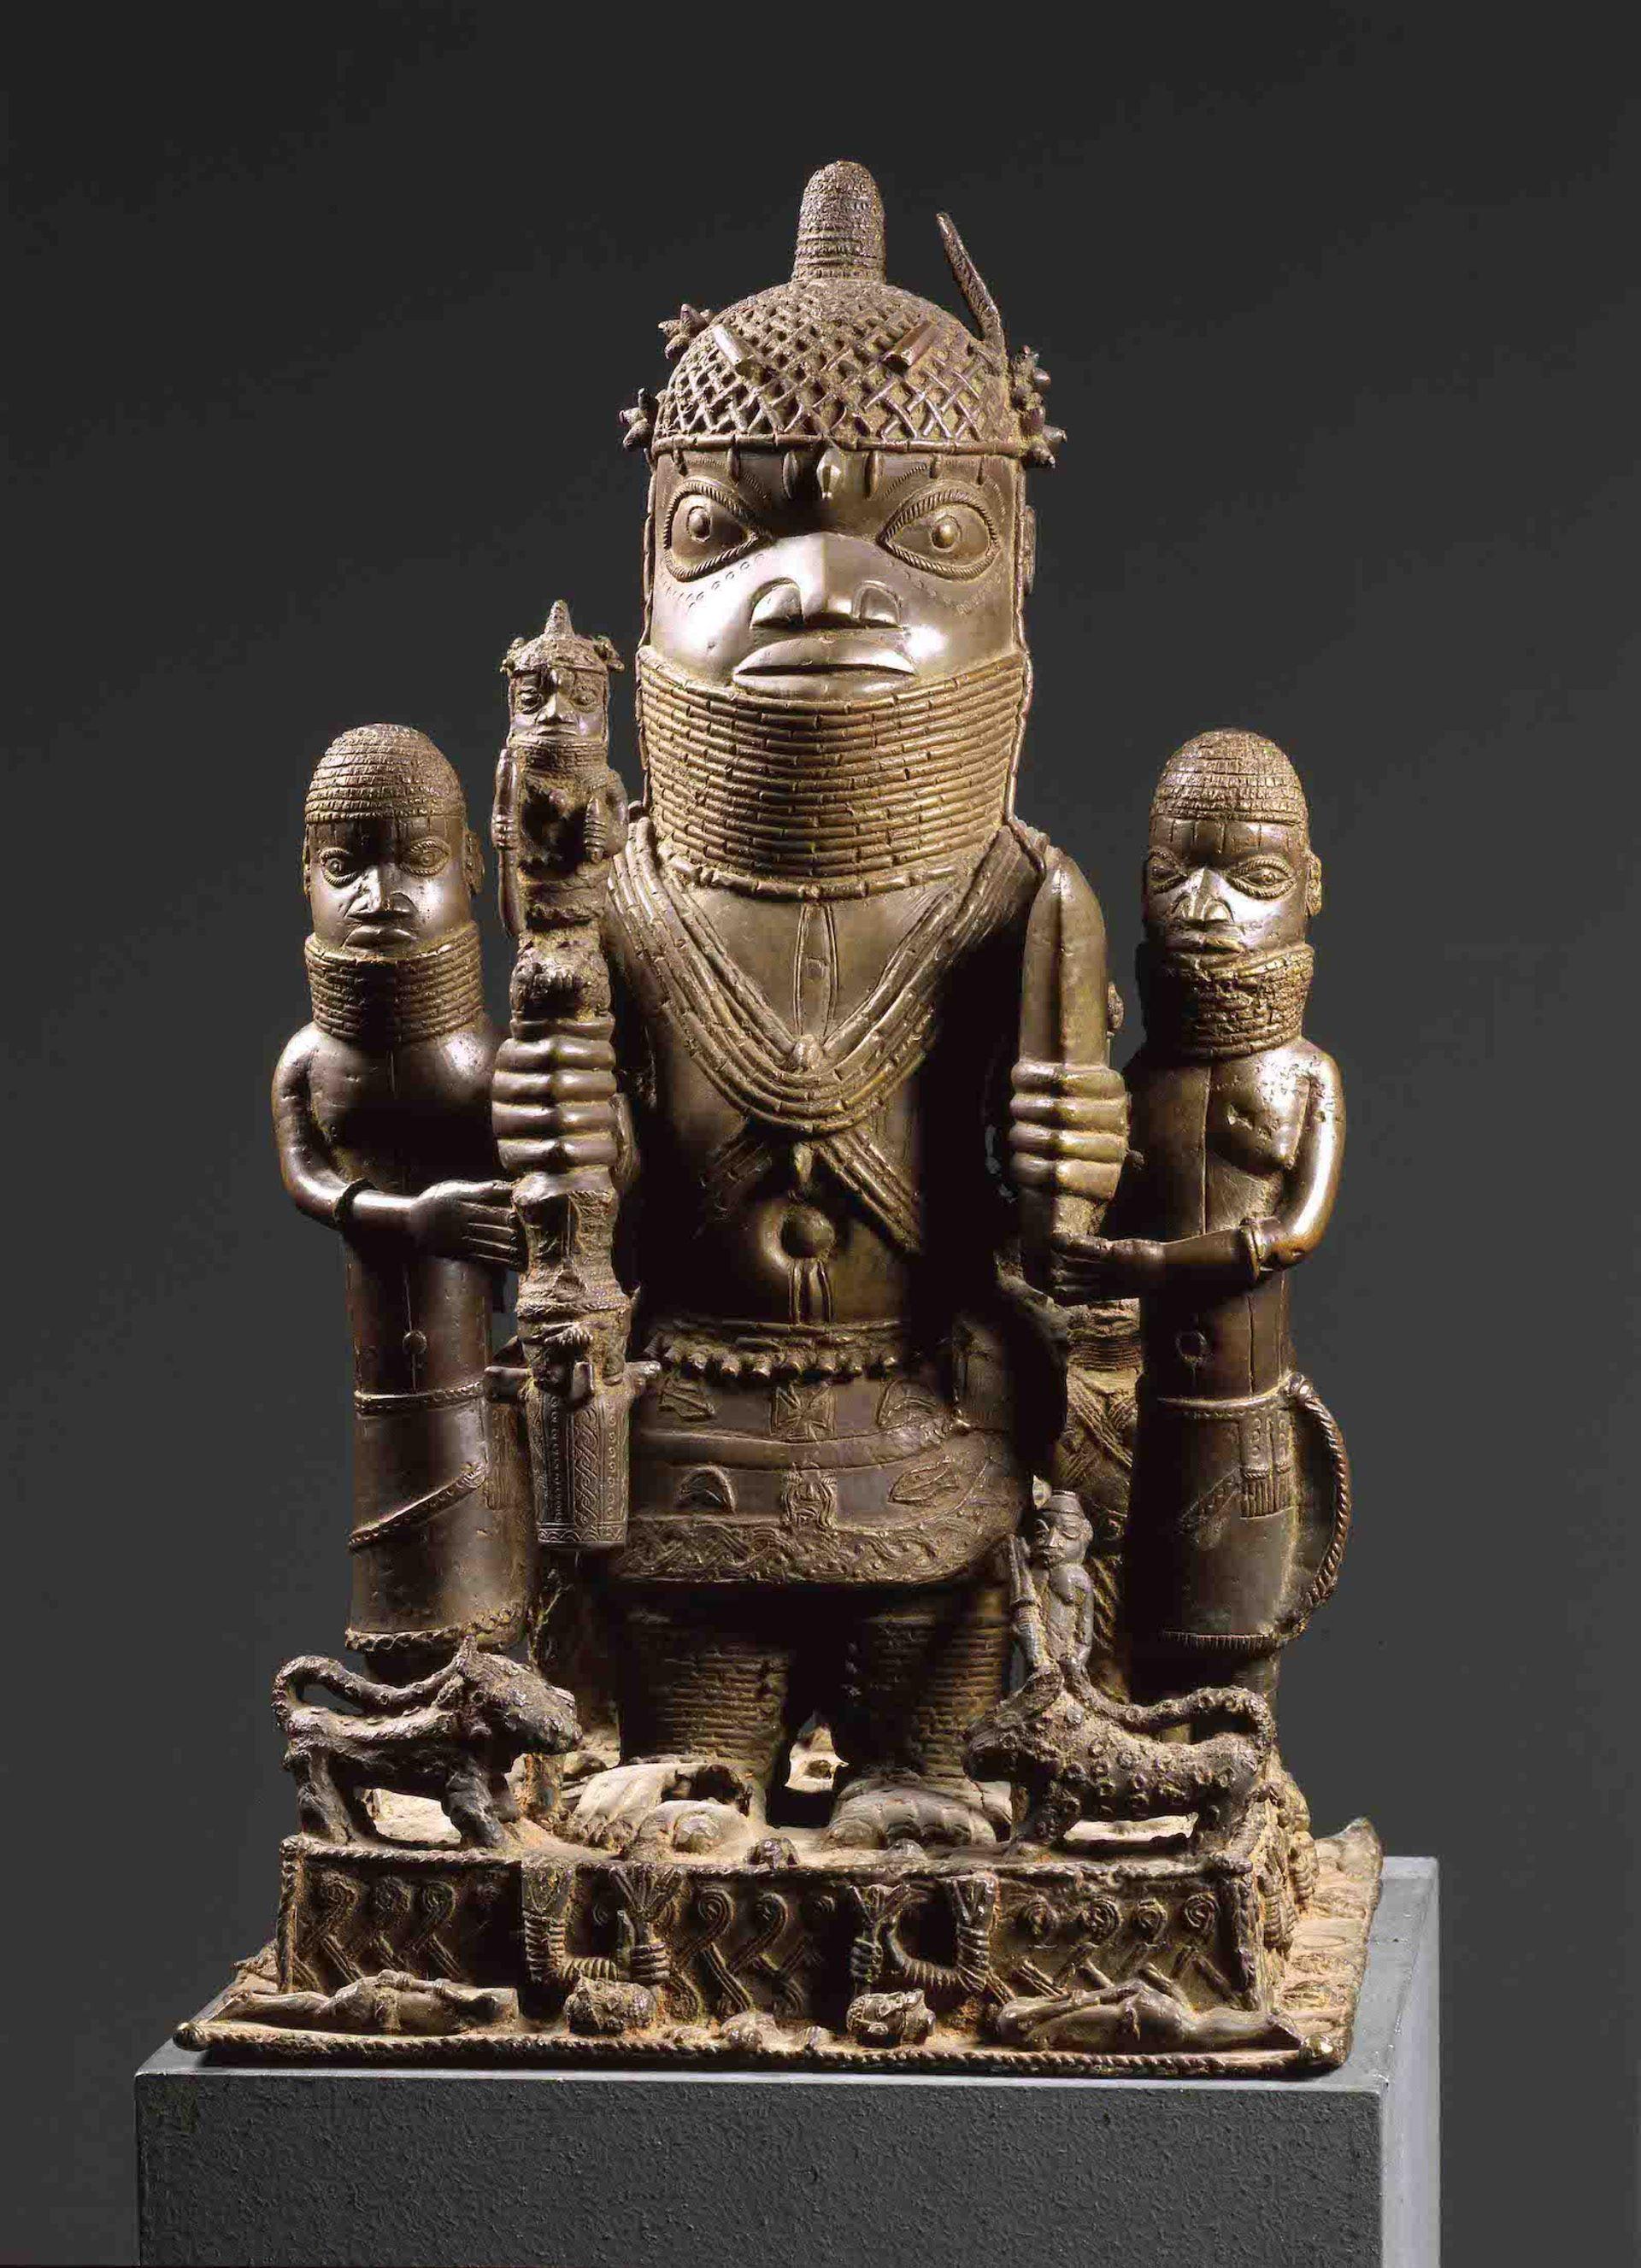 Benin bronzes are held by a number of European institutions, including Berlin's Ethnology Museum © Staatliche Museen Berlin; Ethnologisches Museum